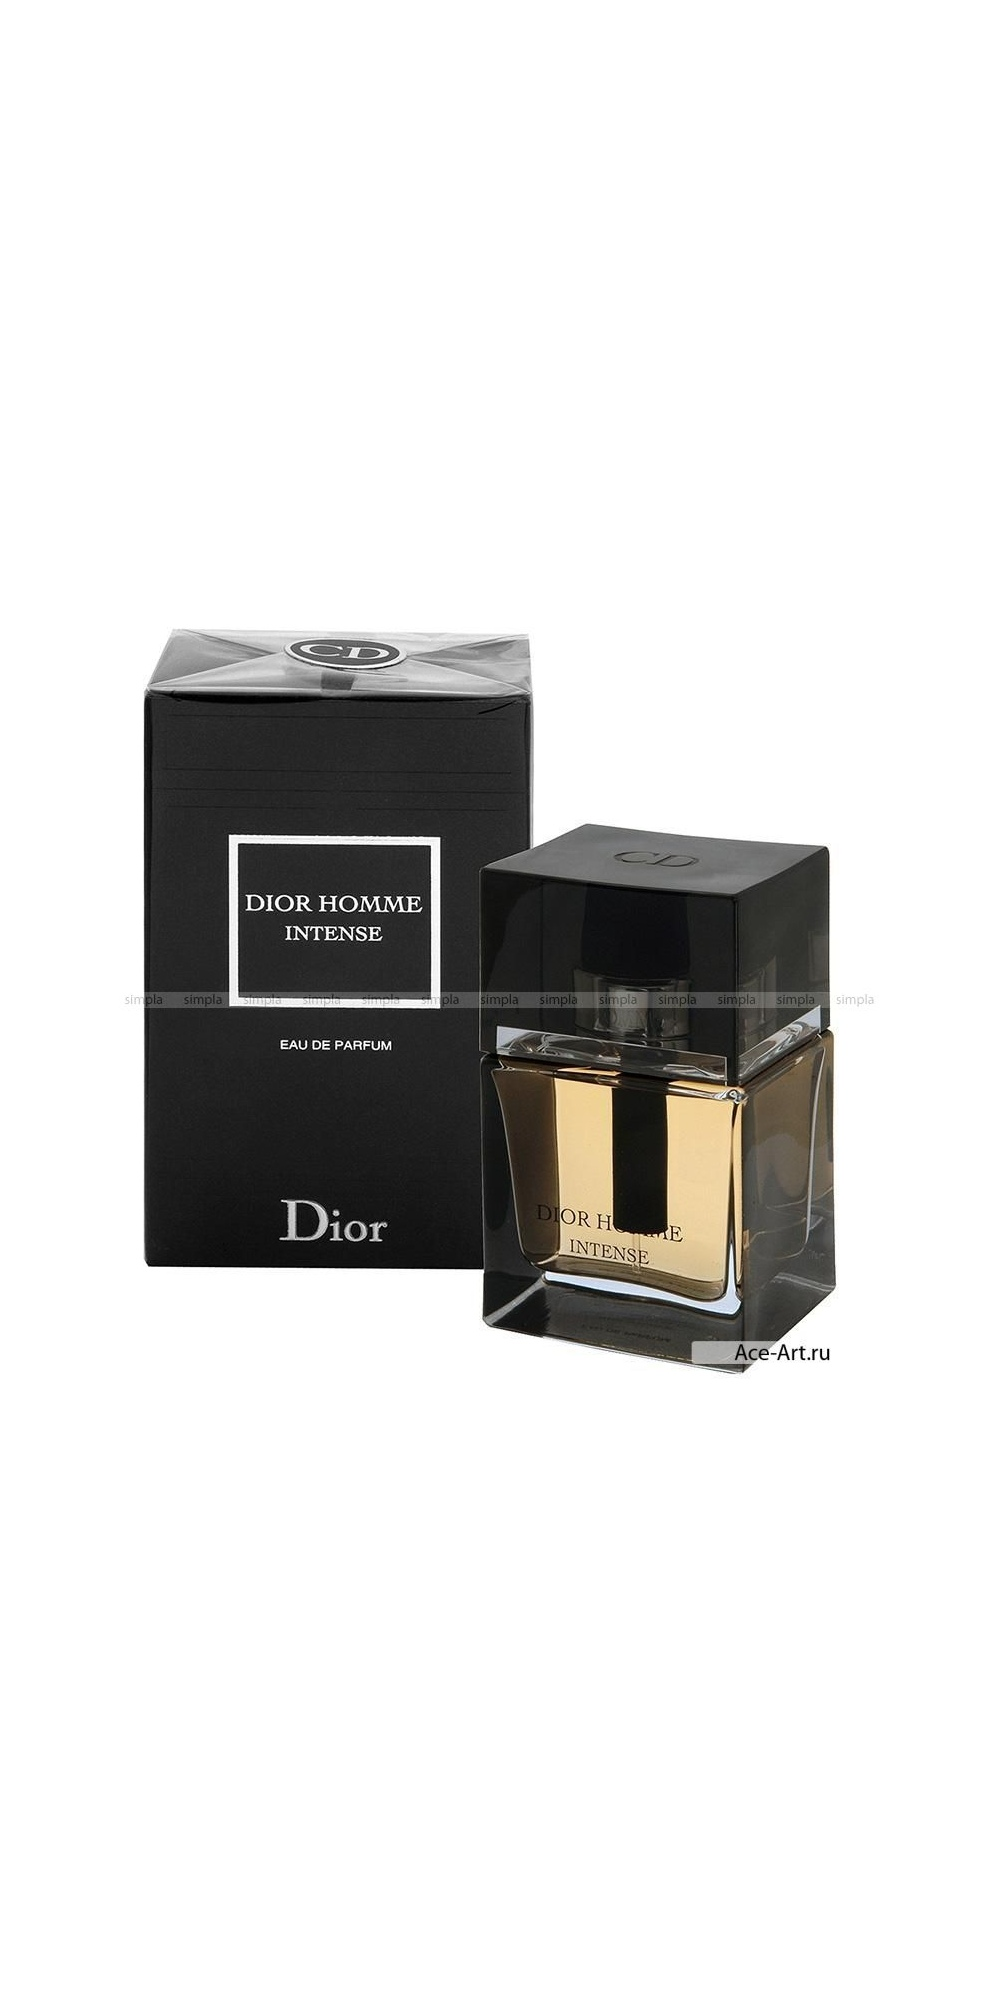 Christian Dior Homme Intense духи купить туалетную воду Christian